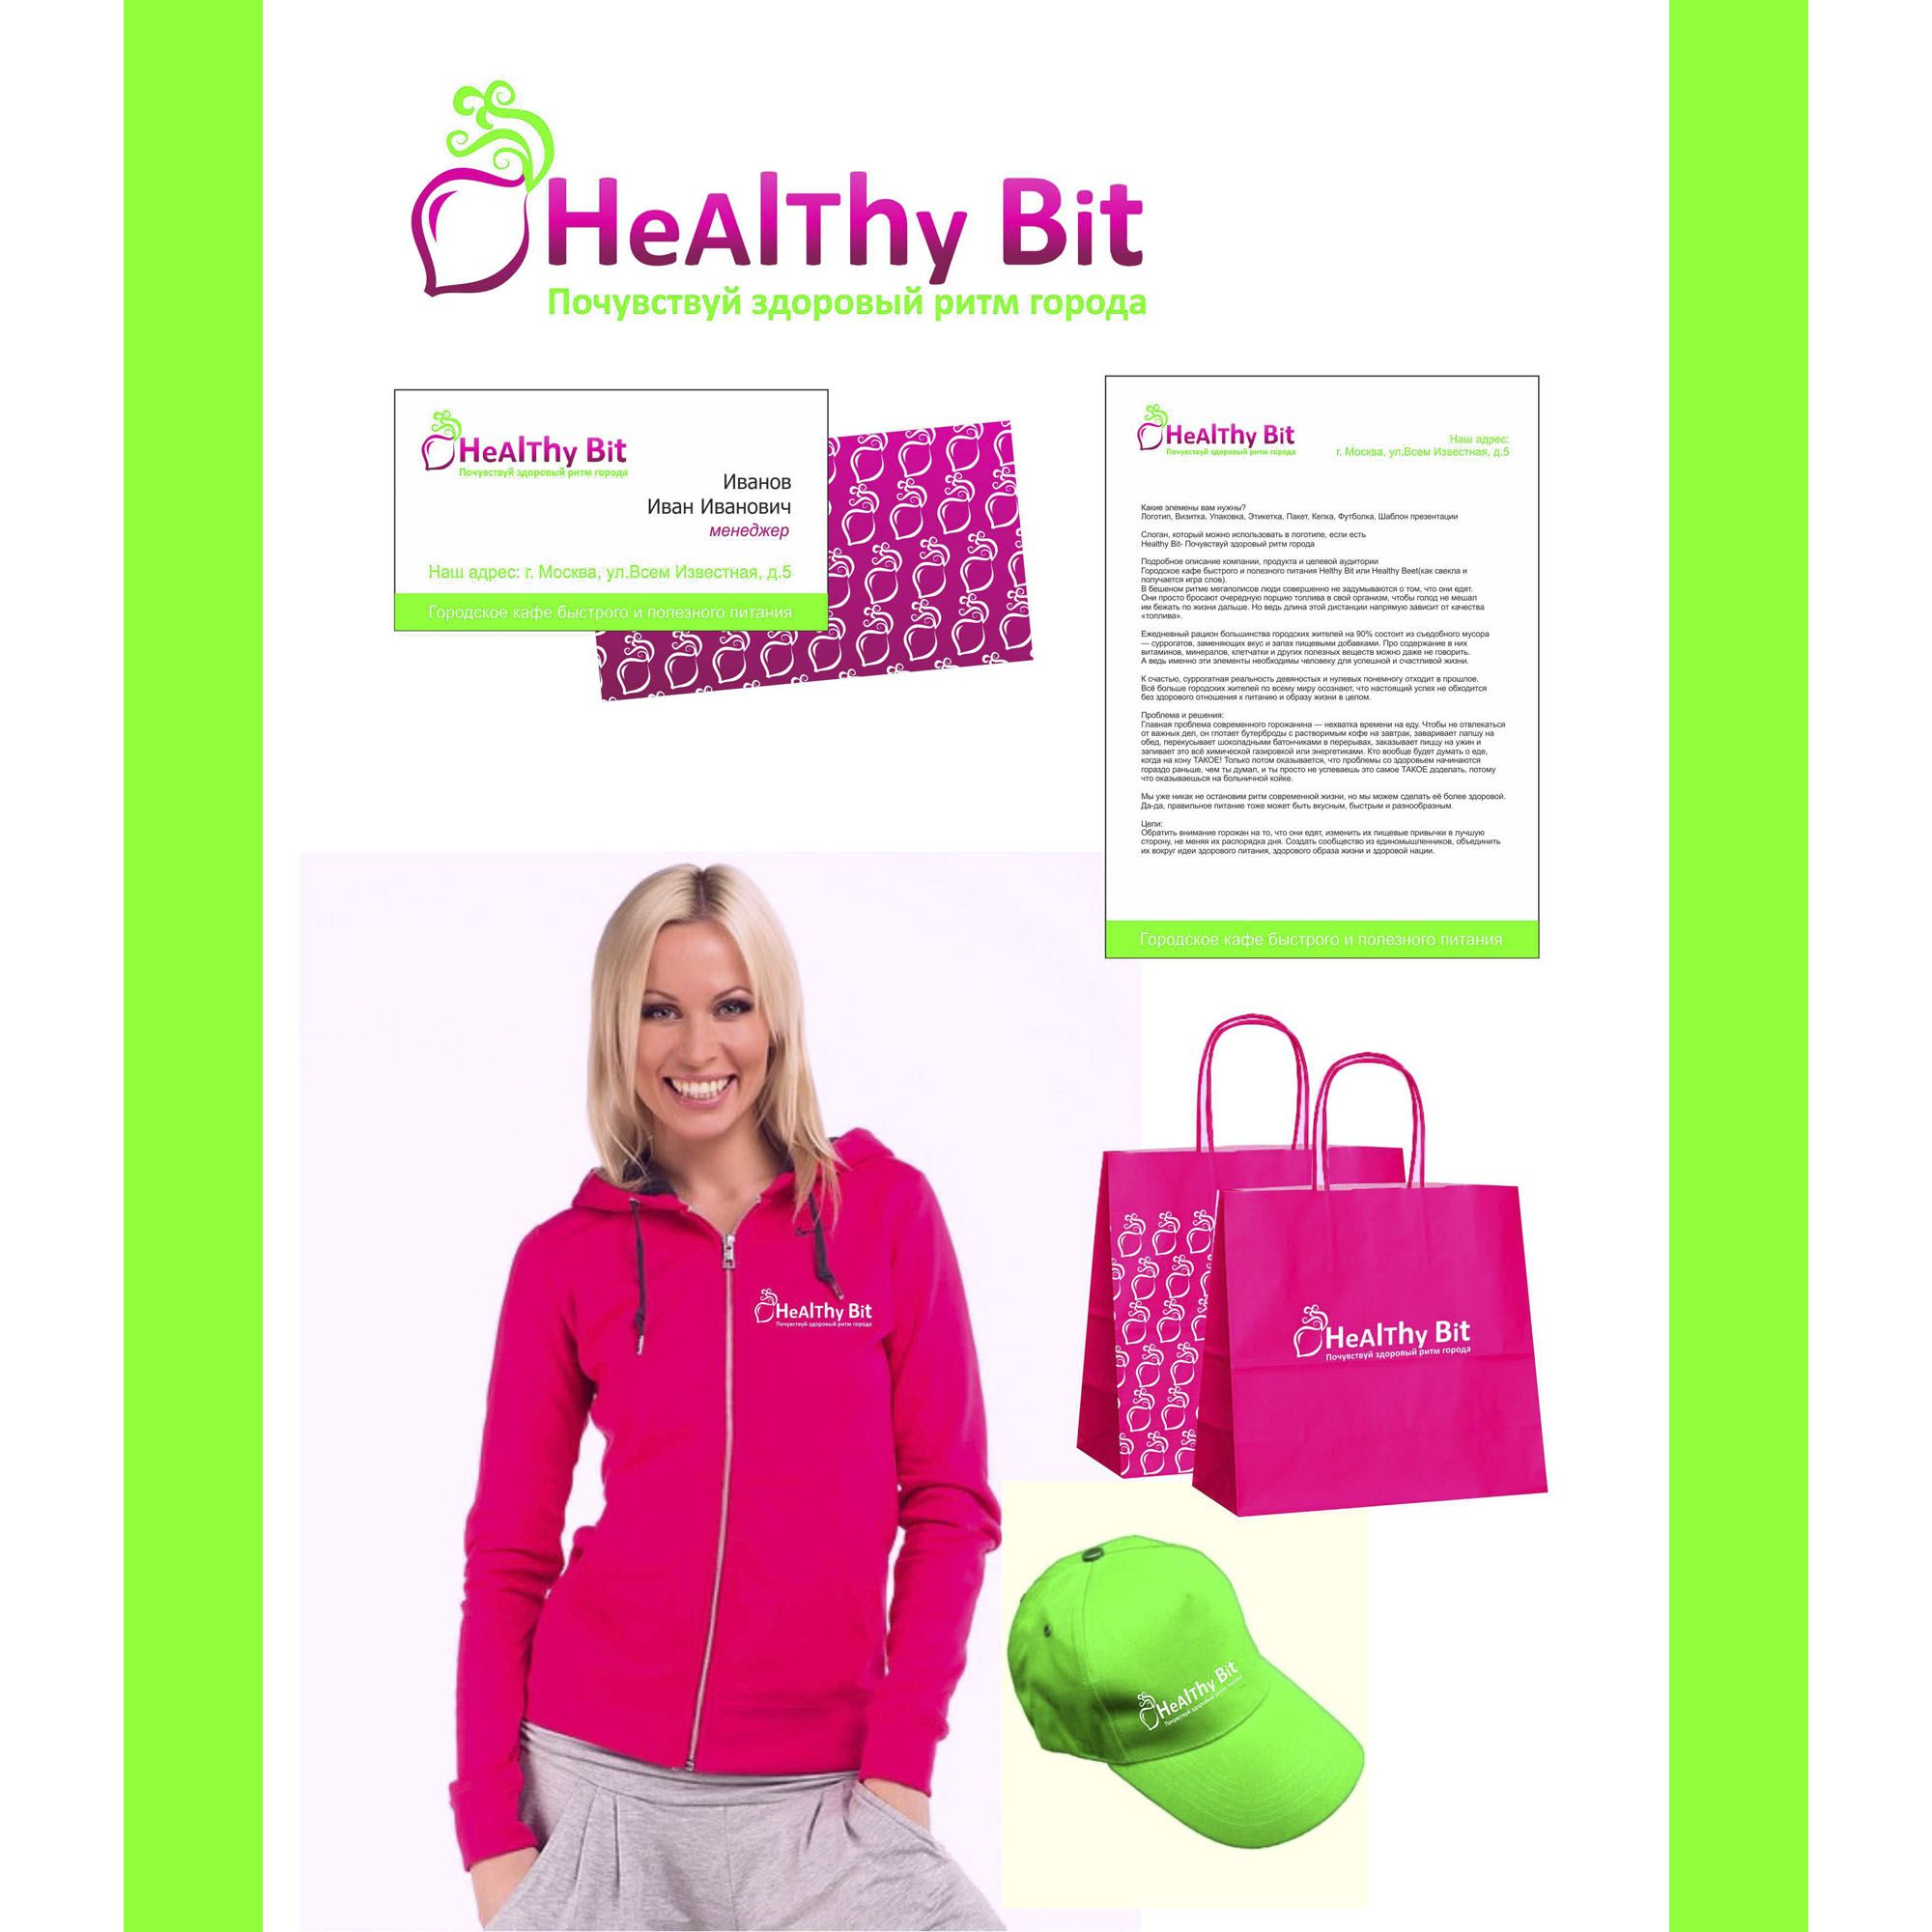 Healthy Bit или Healthy Beet - дизайнер gala_pavlenko